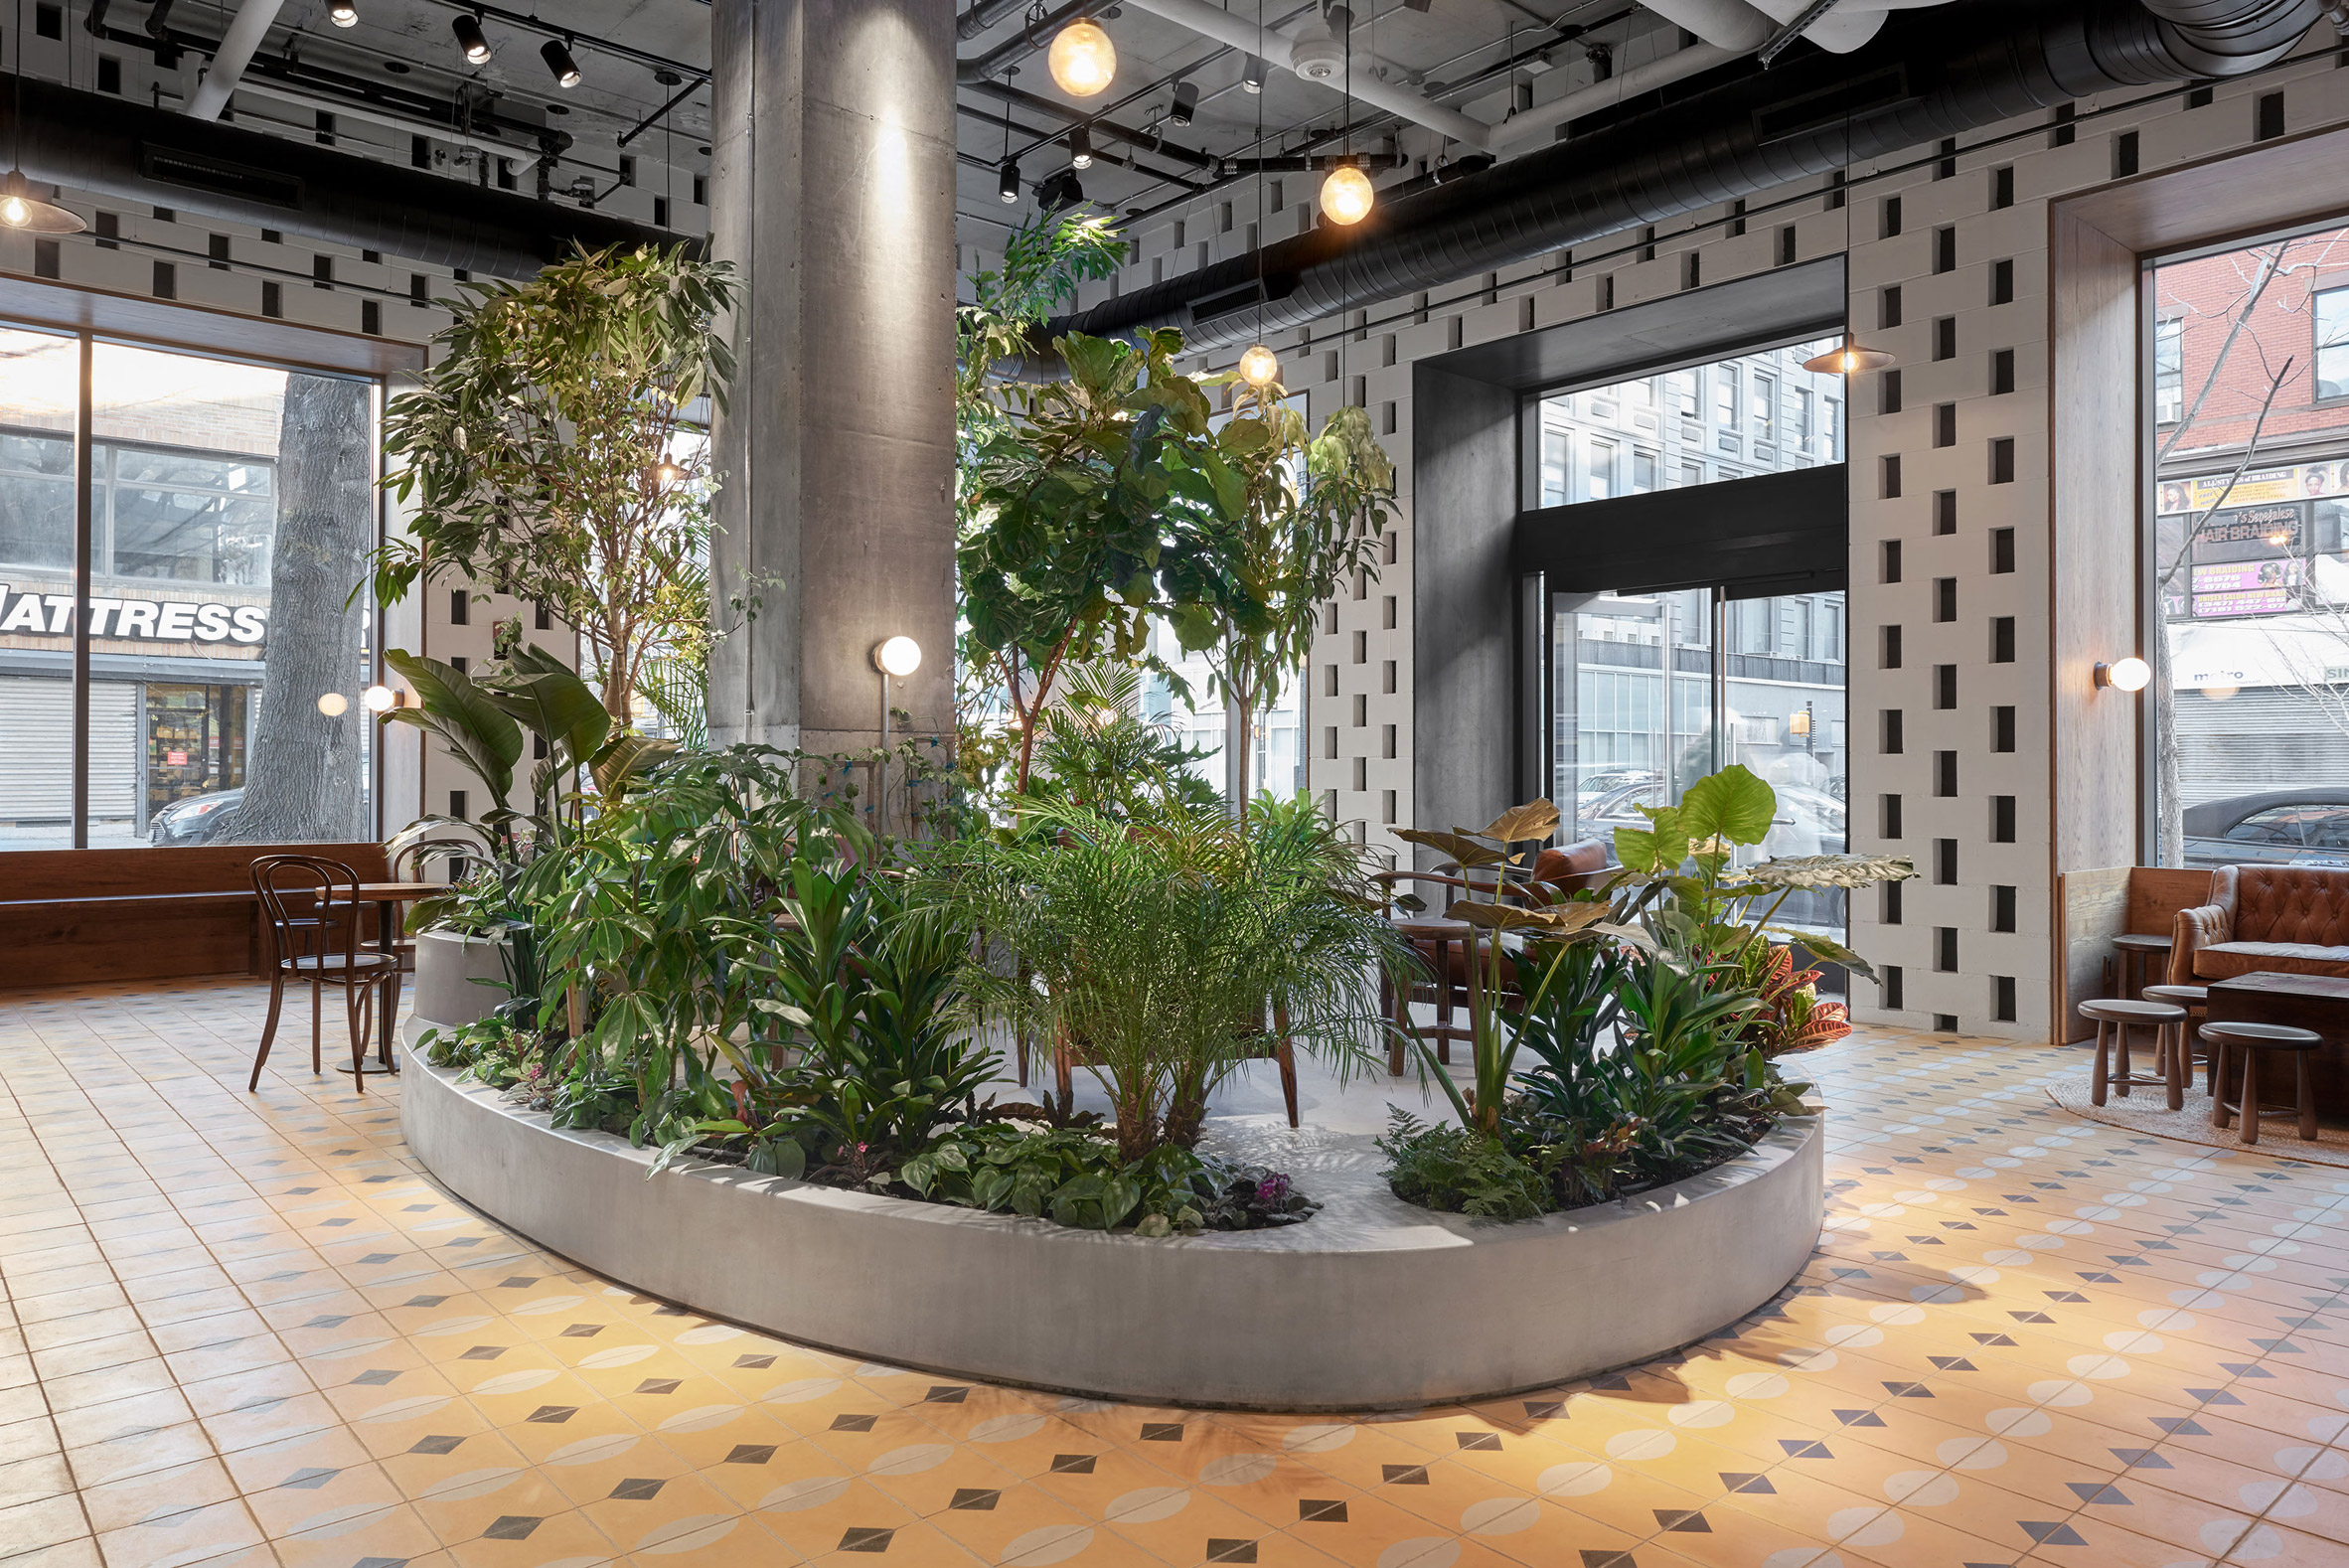 devocion-cafe-lot-interiors-brooklyn-new-york-city-usa_dezeen_2364_col_3.jpg